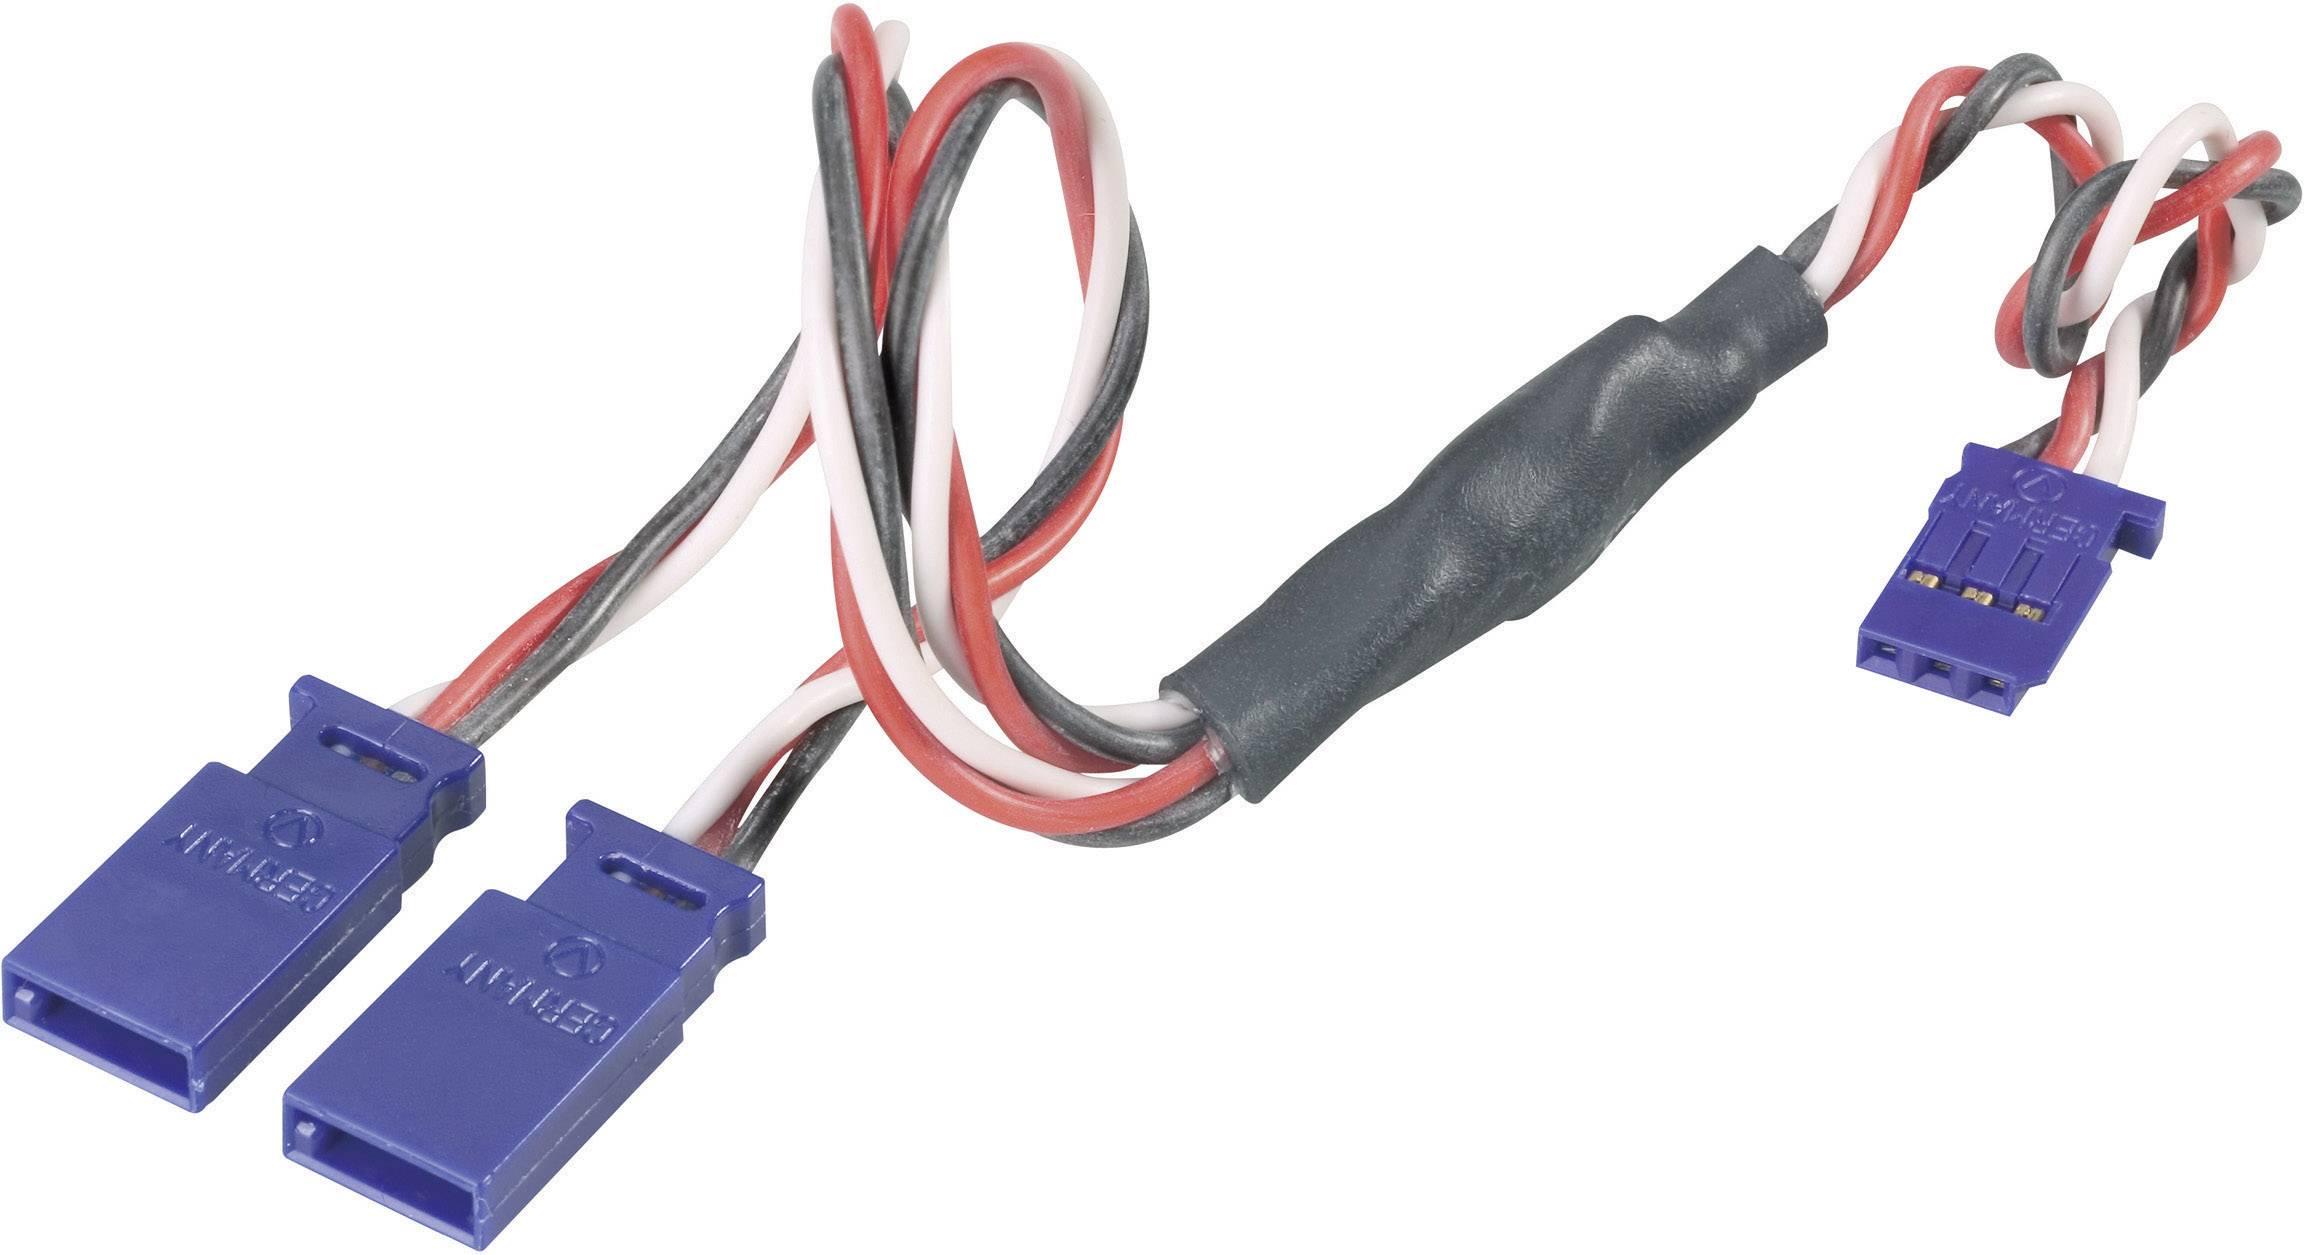 Y kabel Modelcraft, konektor Futaba, 30 cm, 0,50 mm²